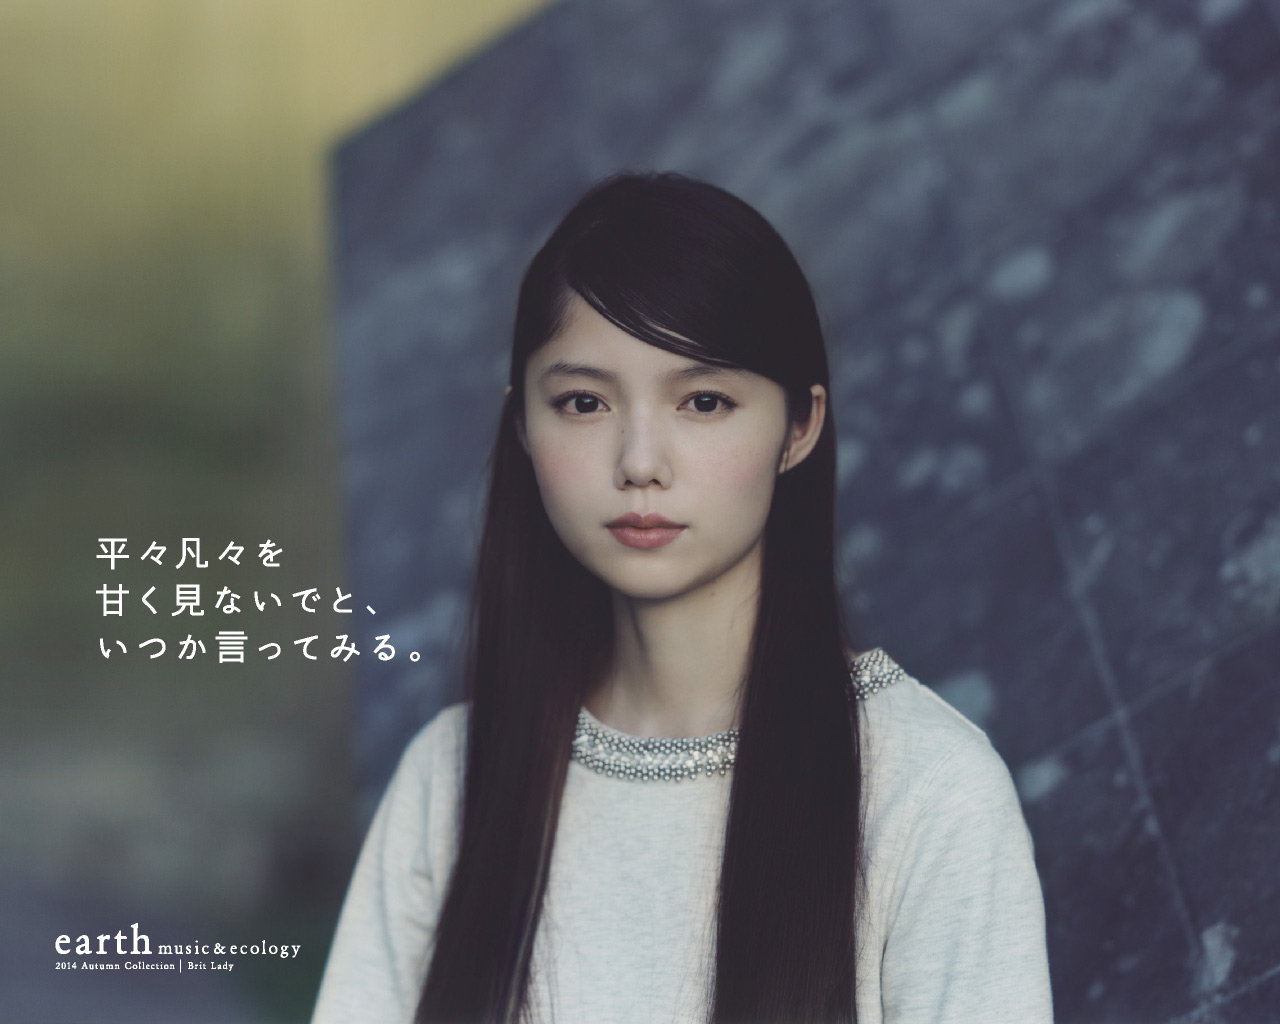 earth music&ecology広告の宮崎あおい